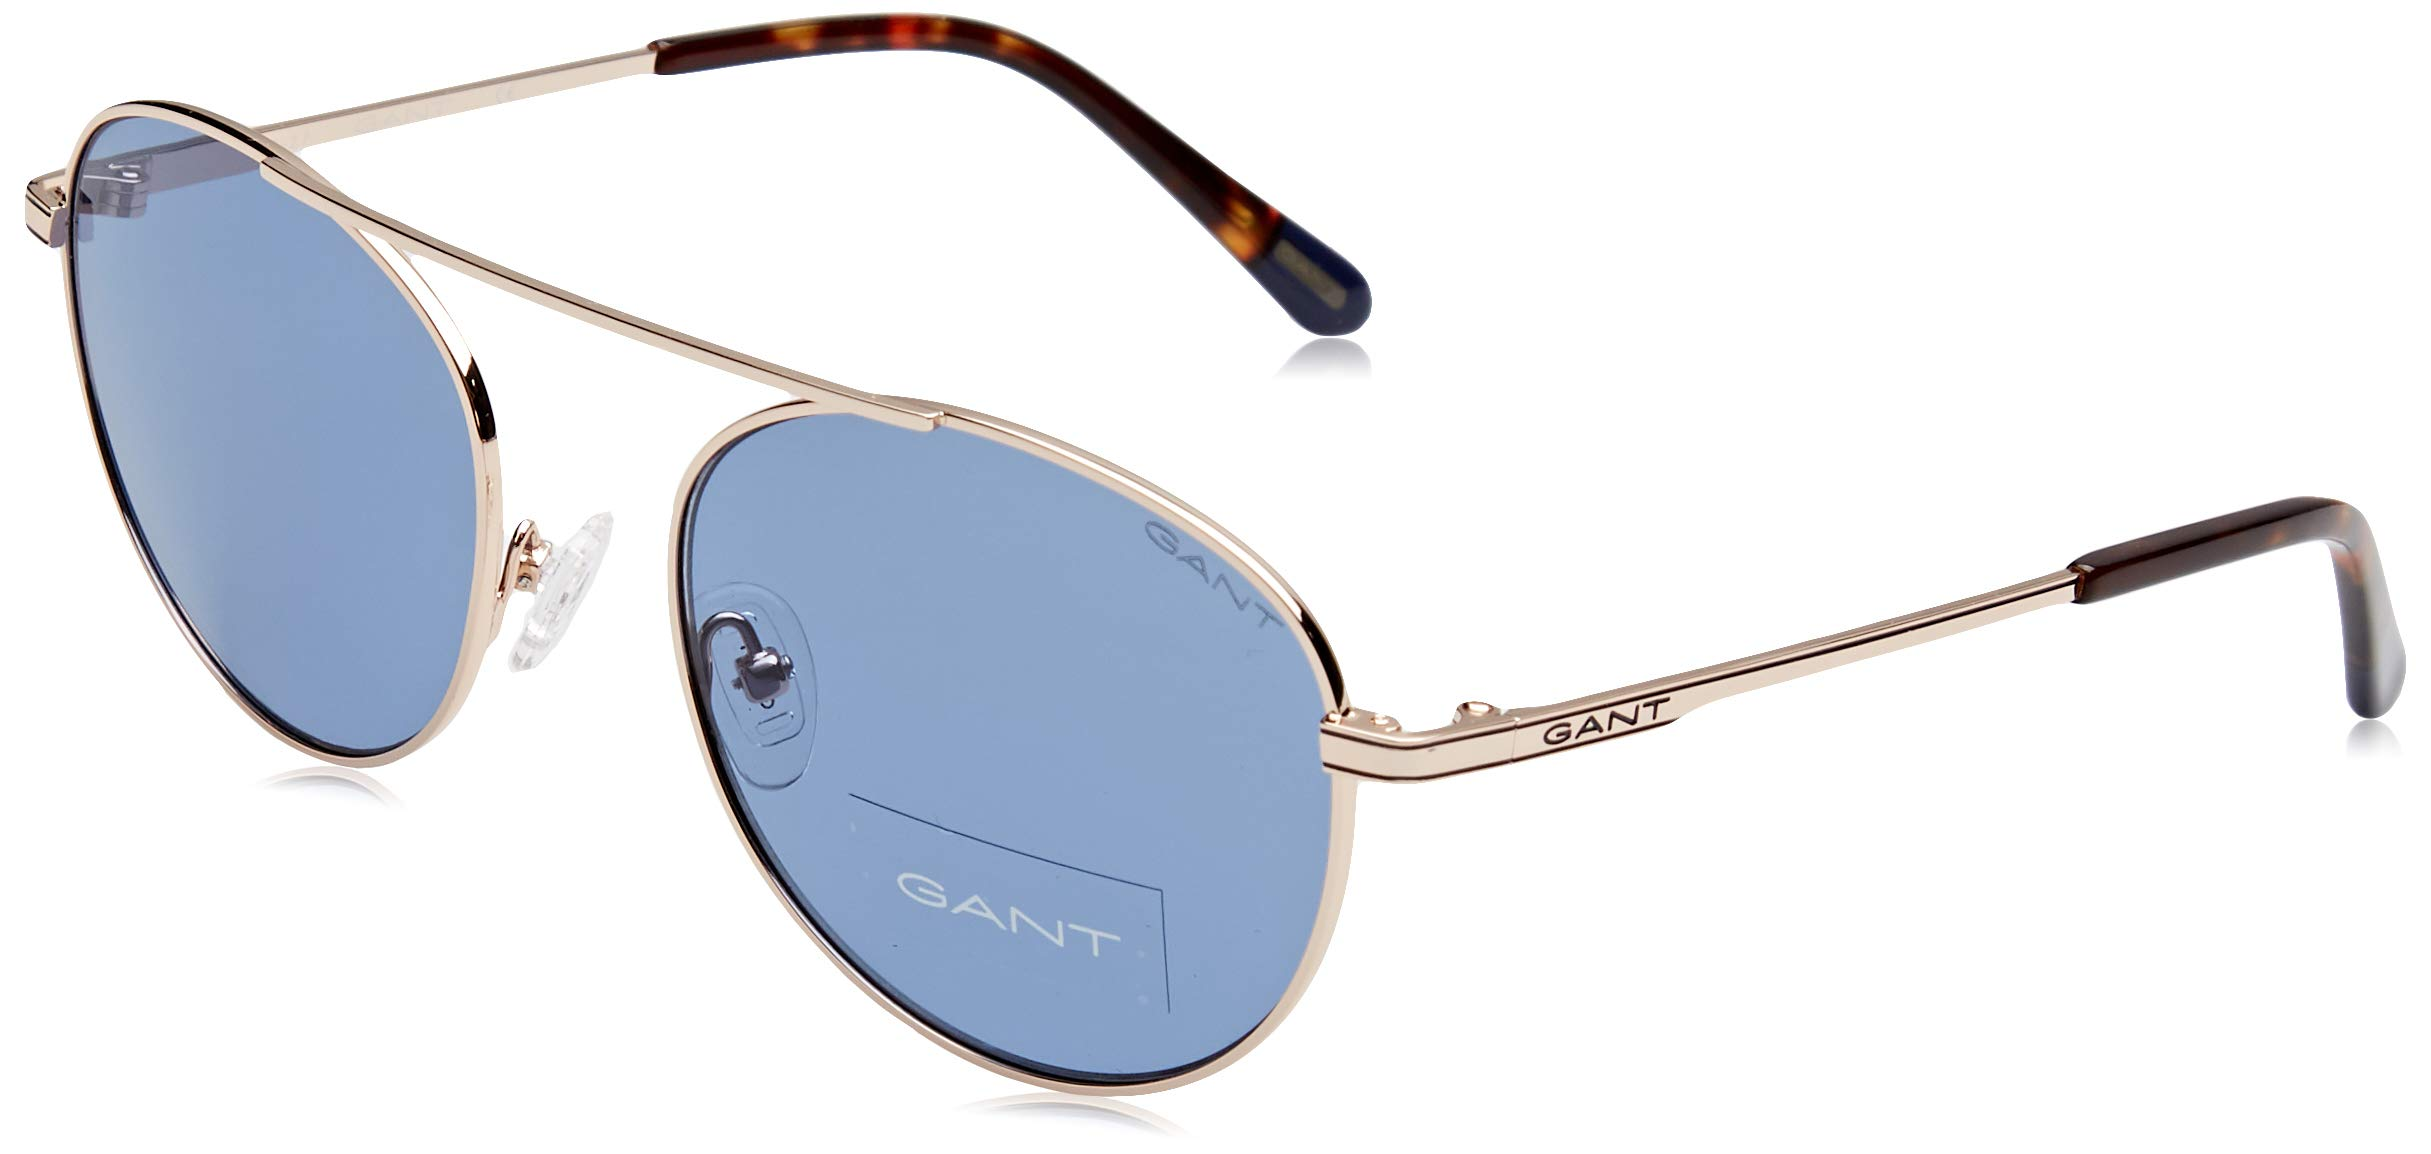 De LunettesBleugold Montures Gant Ga7106 Homme blue54 lJTK3cFu1